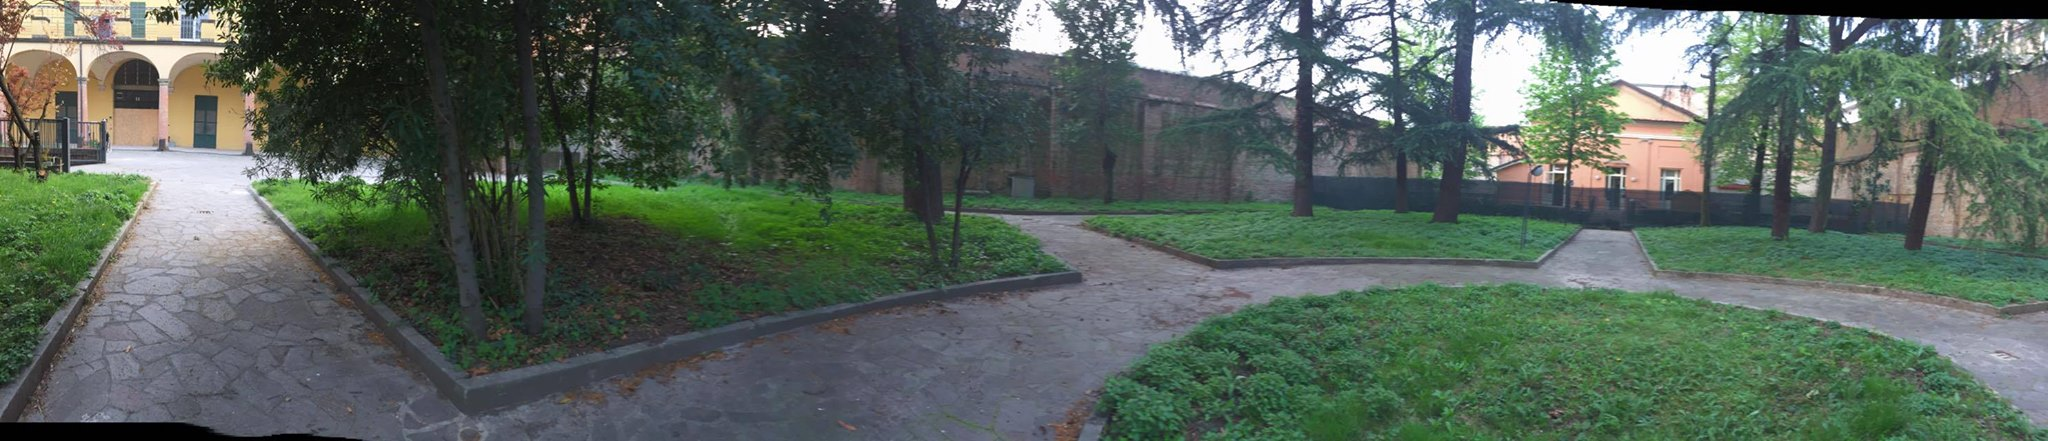 giardino santa marta bologna